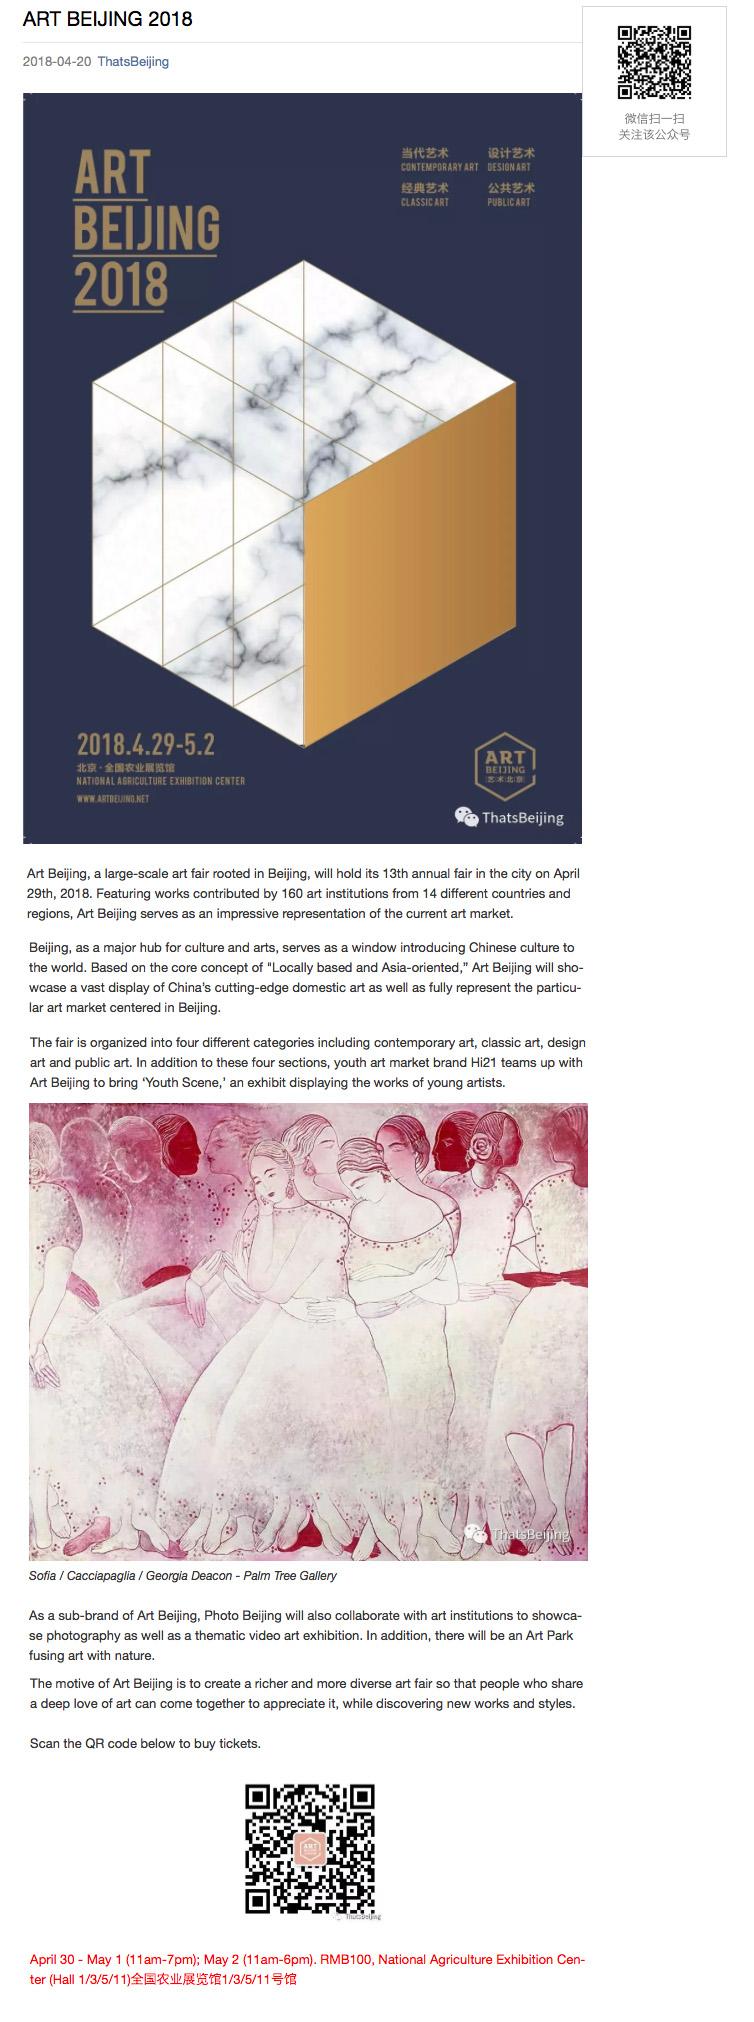 art_beijing_2018_articolo